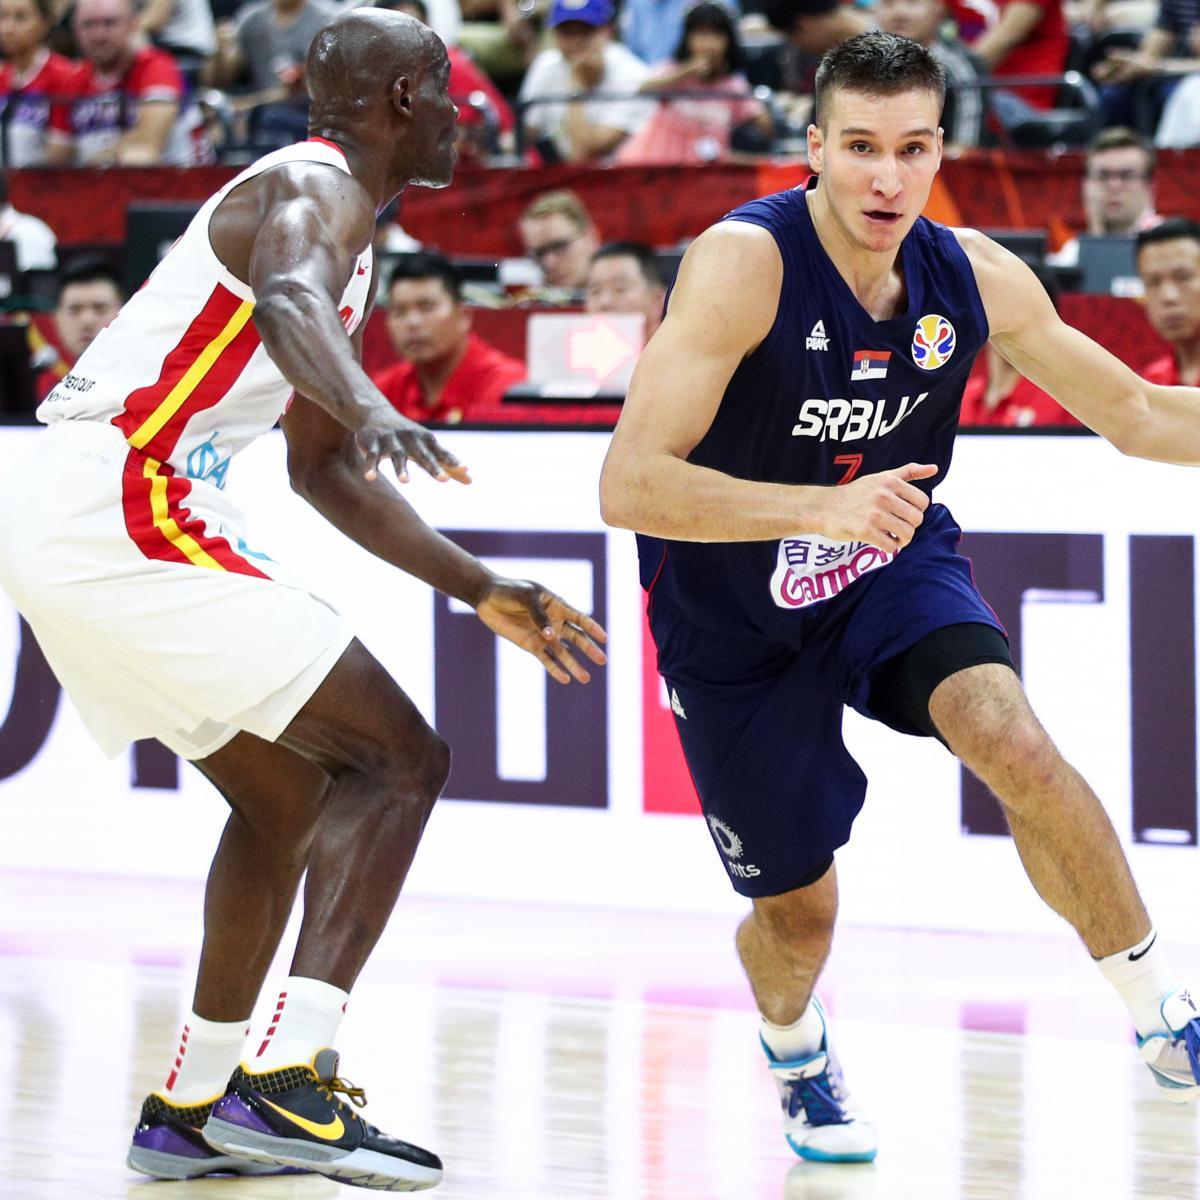 Serbia vs. Gilas Pilipinas: Odds, Time, Live Stream for 2019 FIBA World Cup